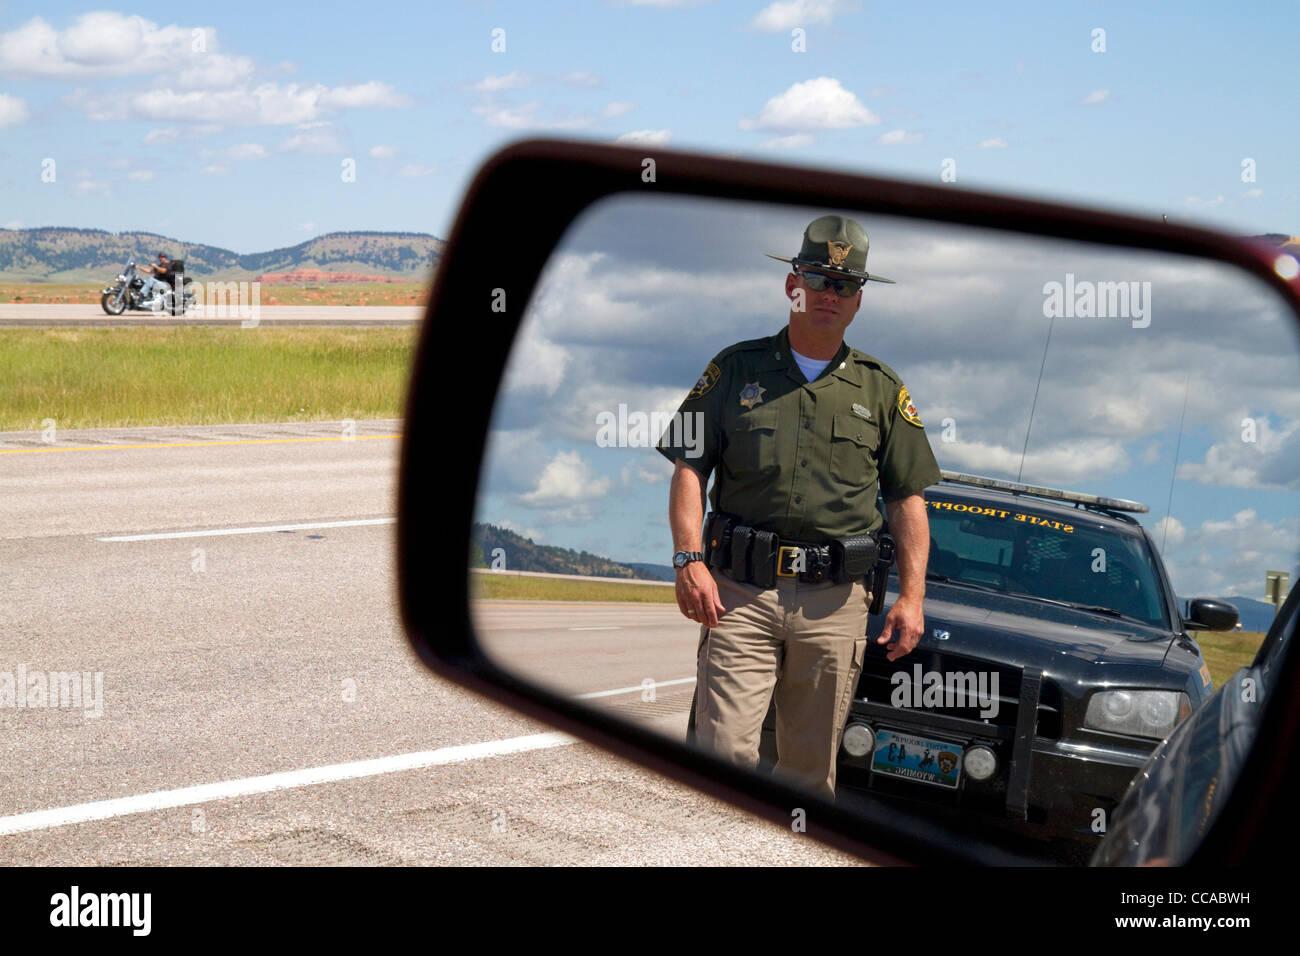 Highway Patrol Stock Photos & Highway Patrol Stock Images